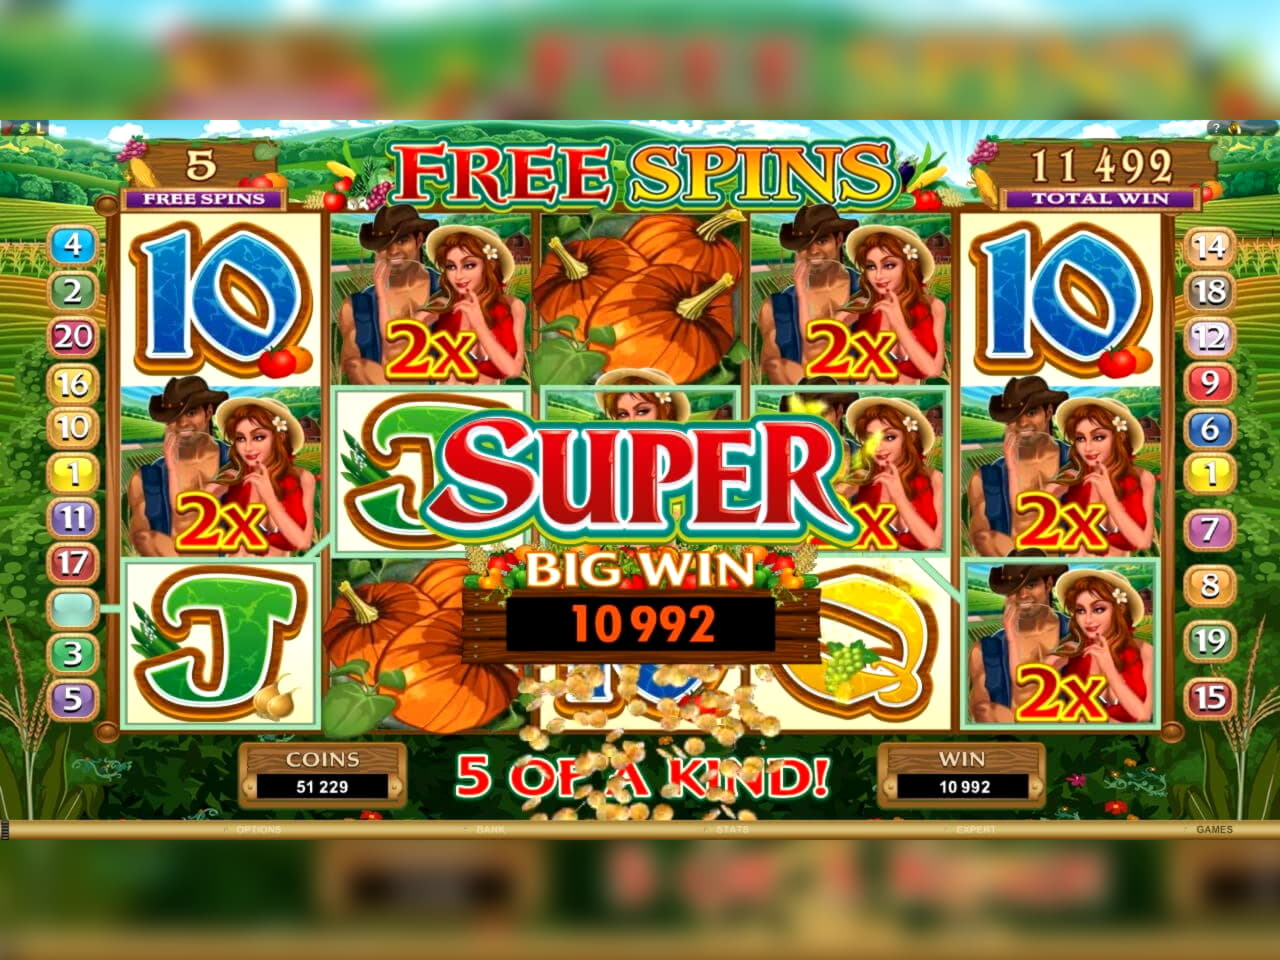 33 free casino spins at Boa Boa Casino